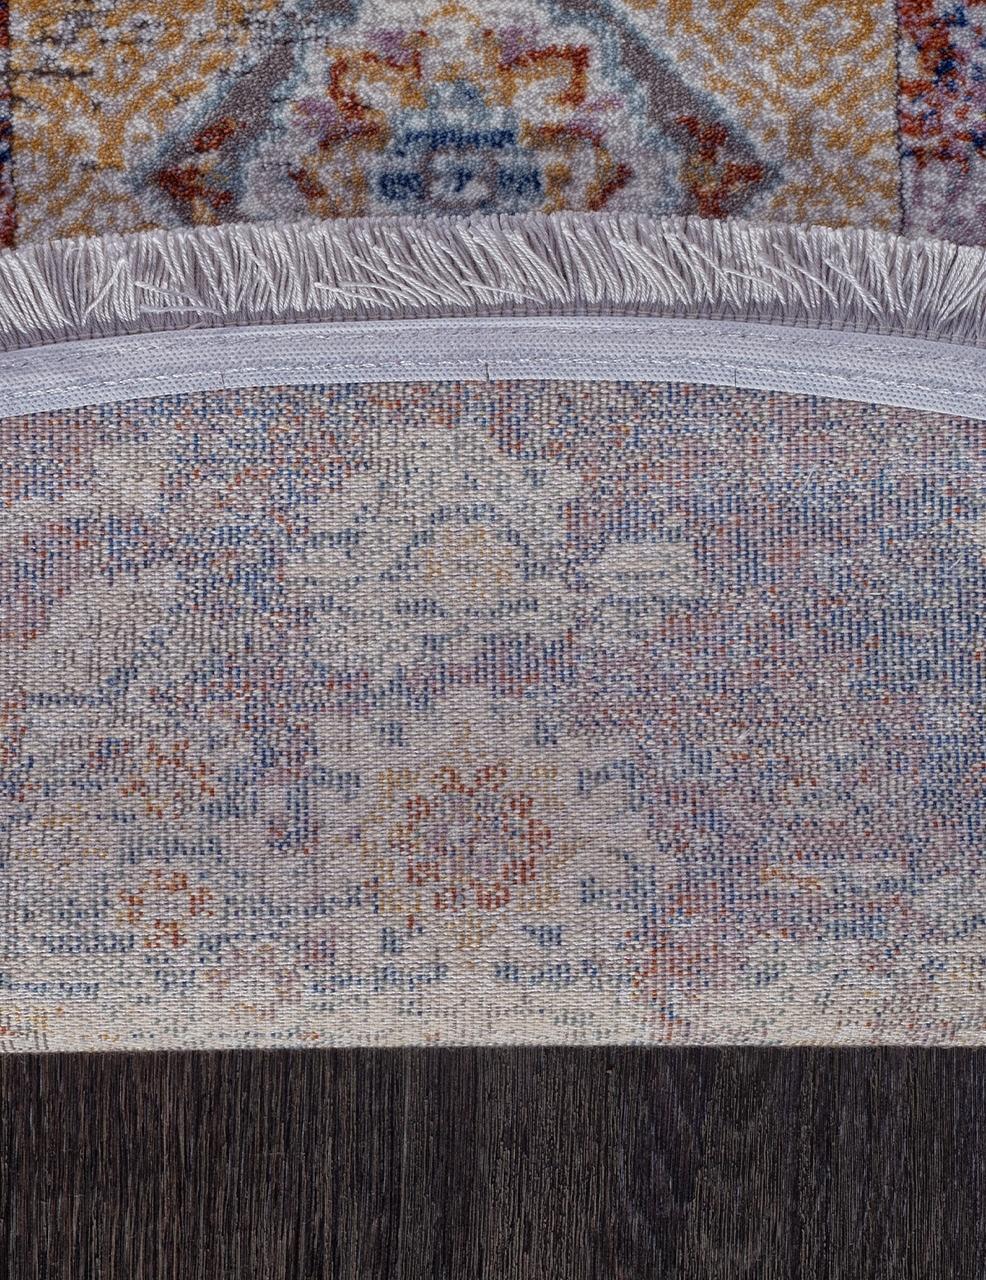 Ковер 05711G - GREY / GREY - Овал - коллекция RIM - фото 5